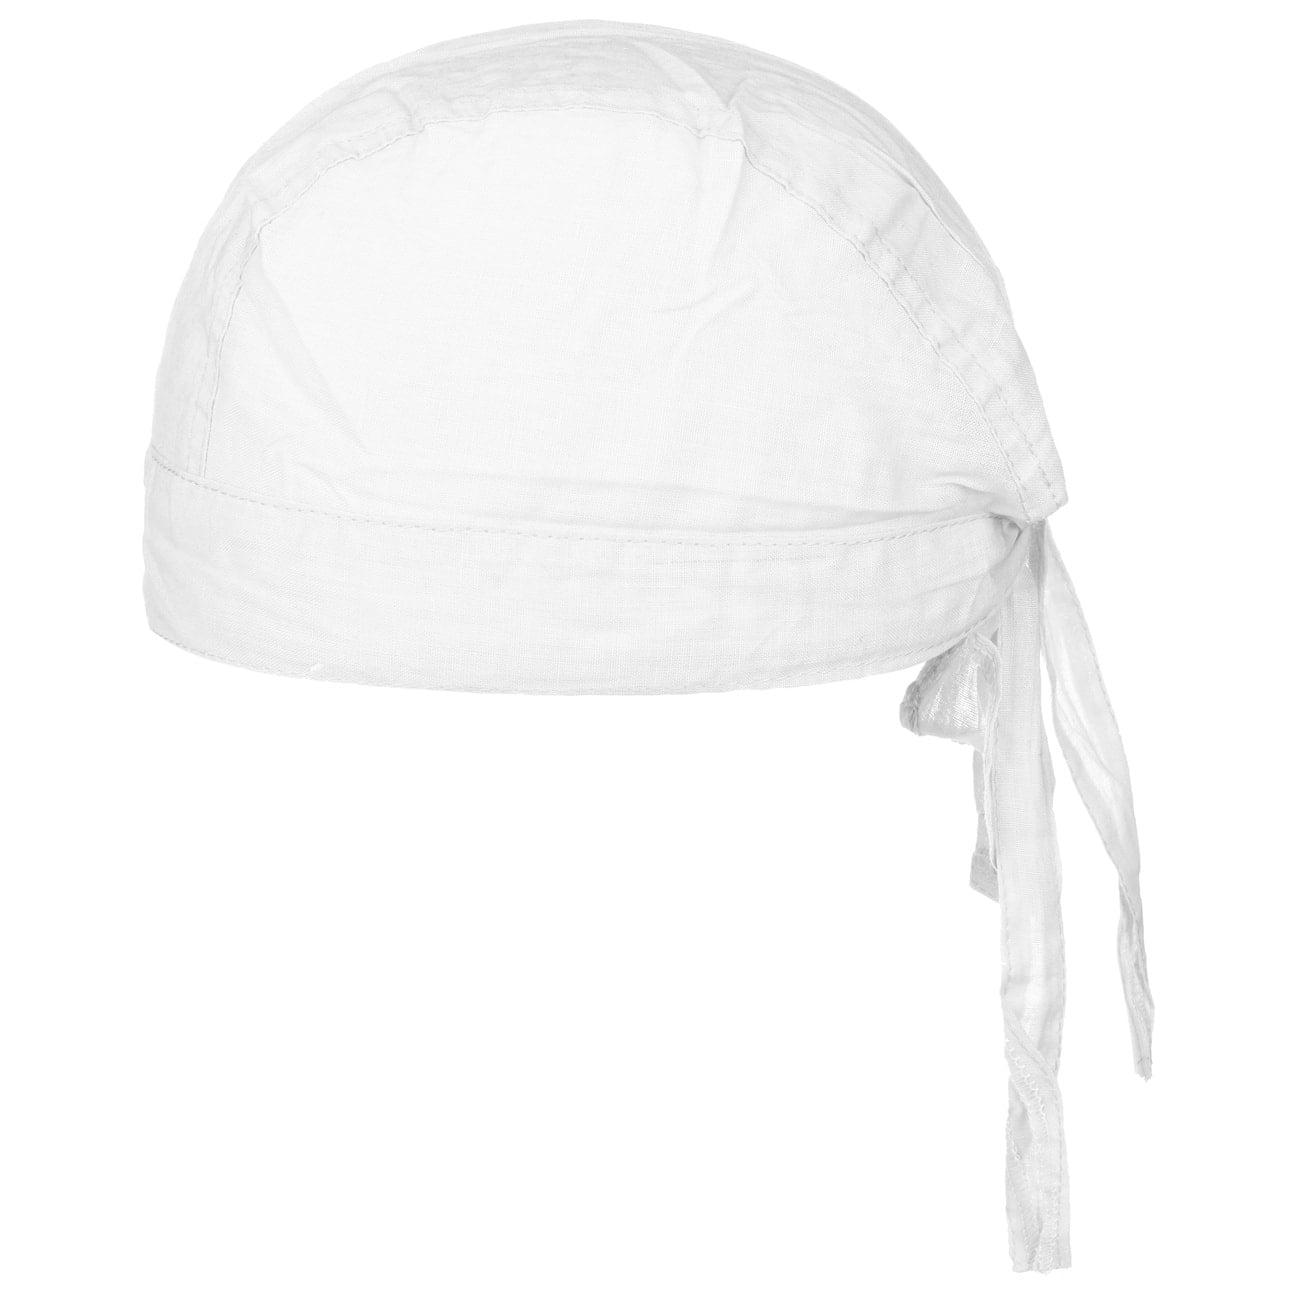 Bandana Corsaire foulards